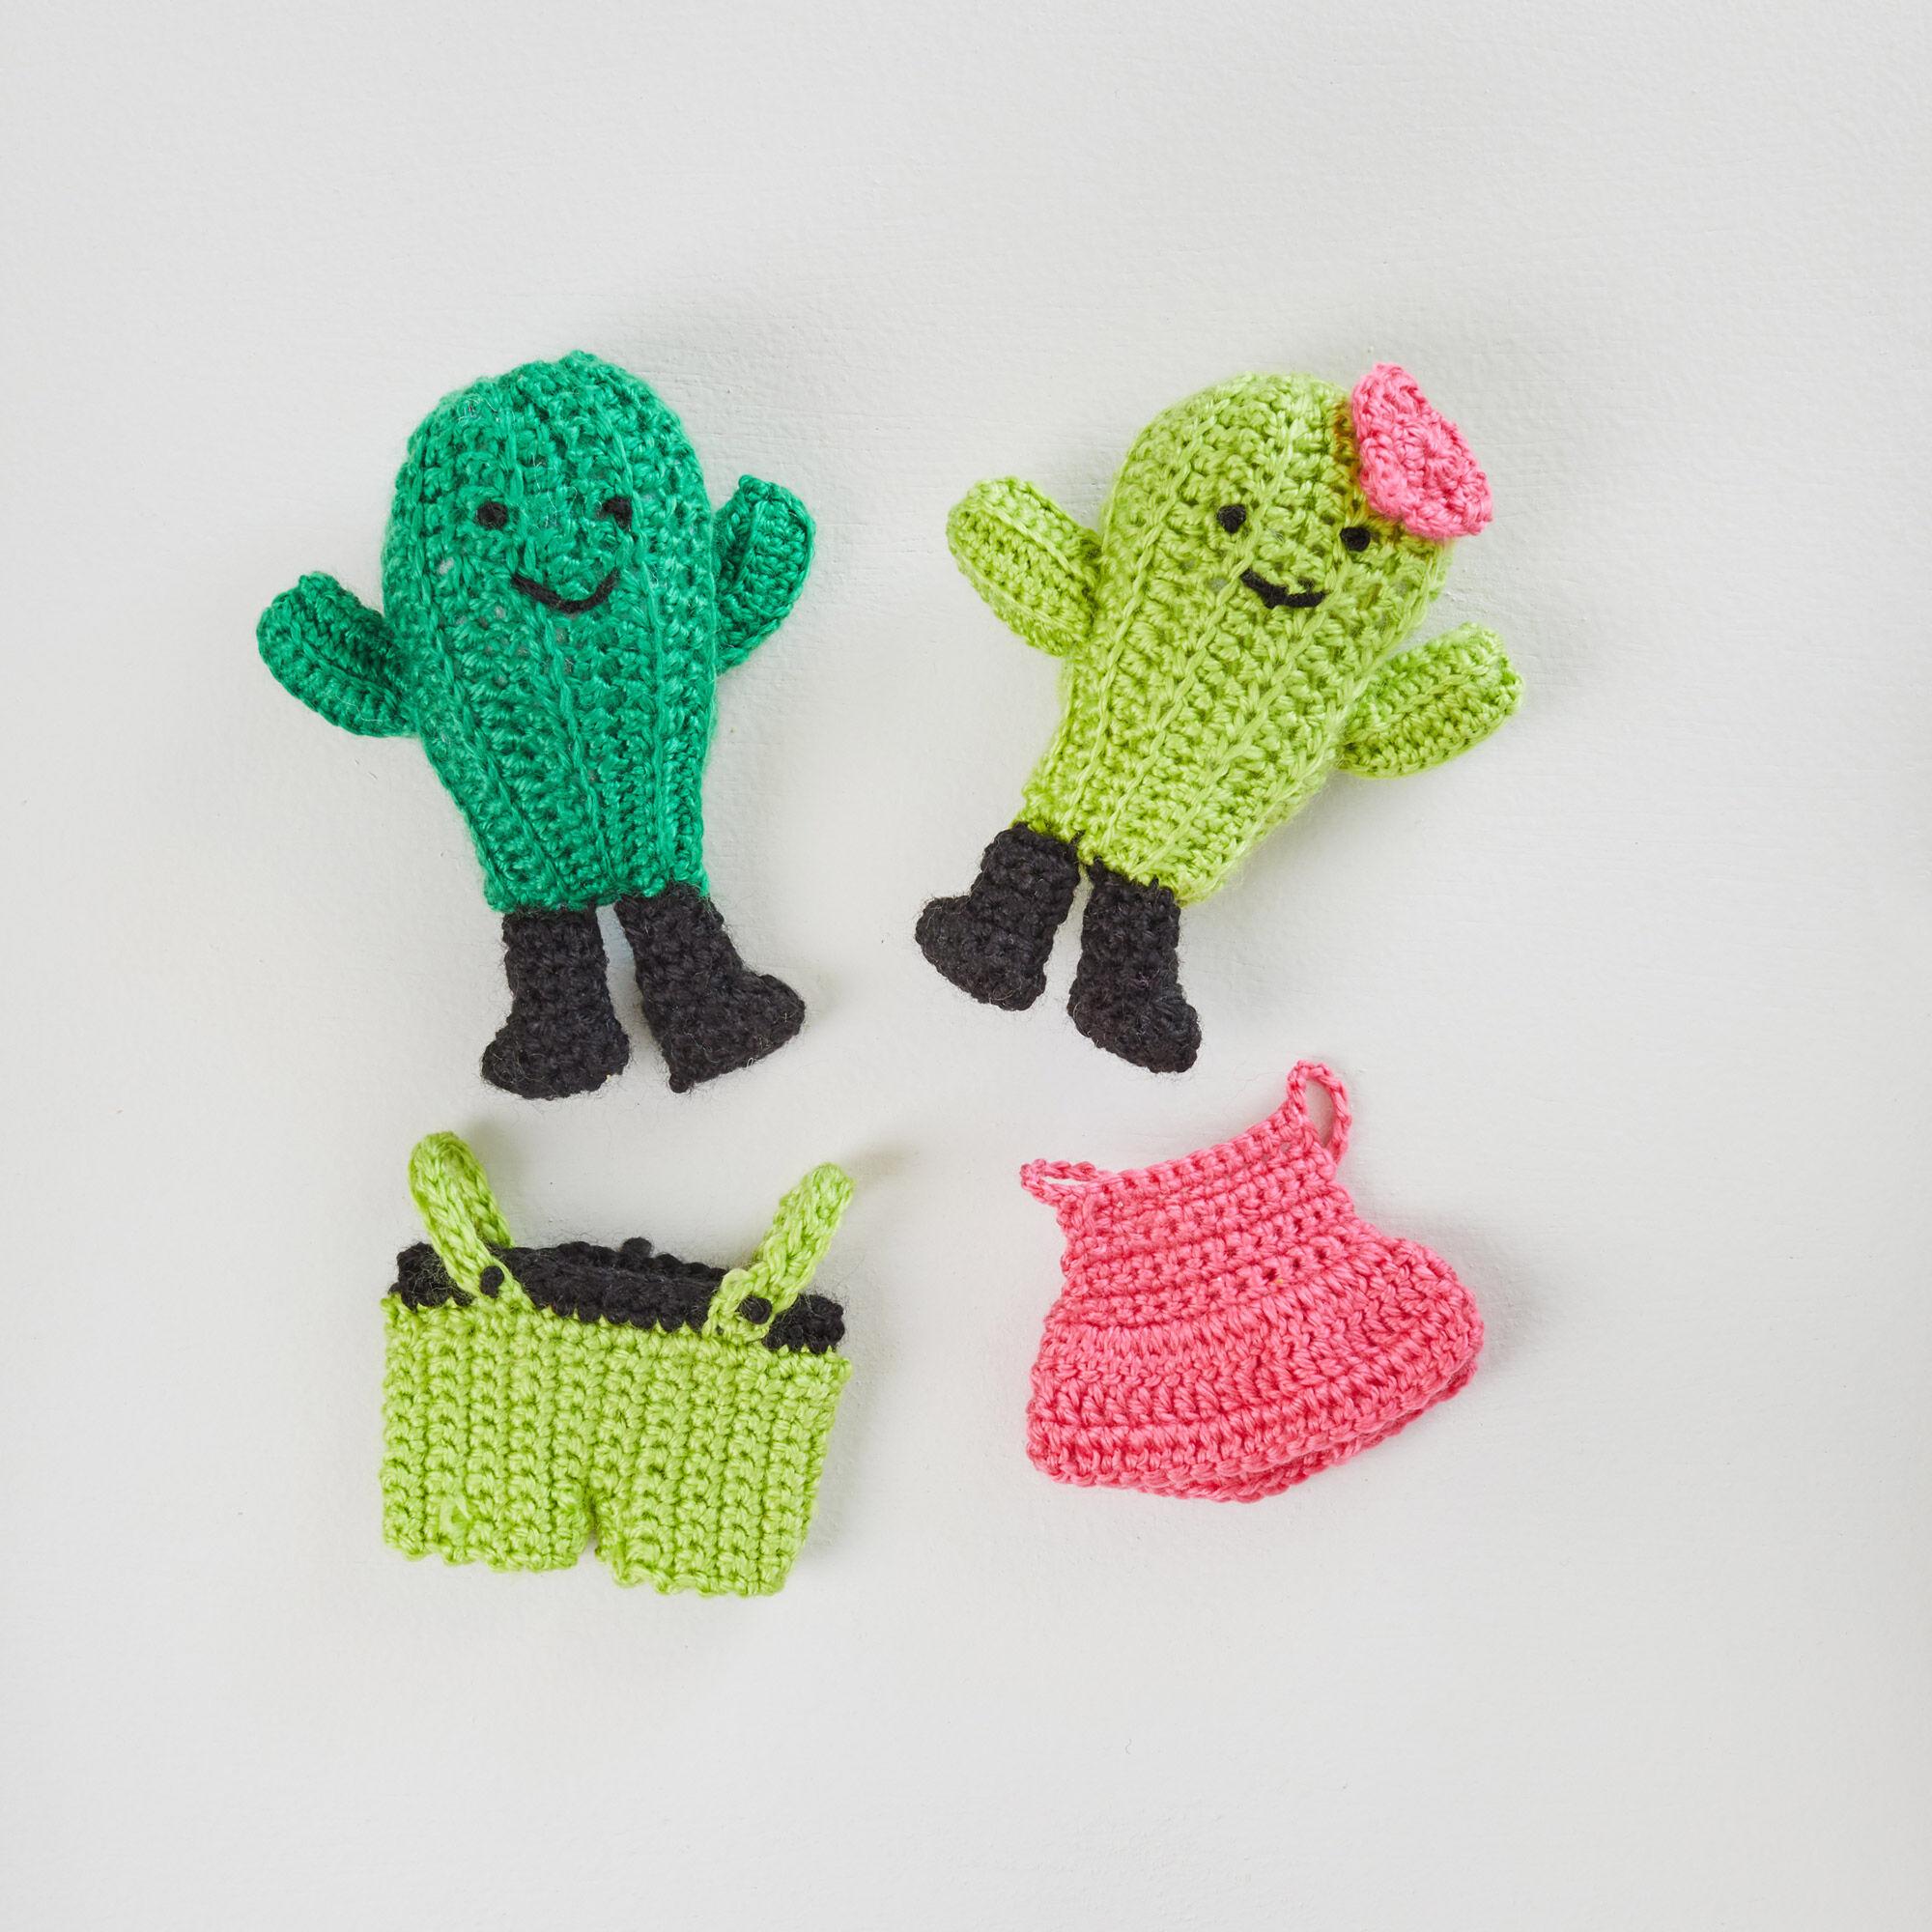 Yarn Review! Red Heart Amigurumi - Crochet Hamburger - YouTube | 2000x2000